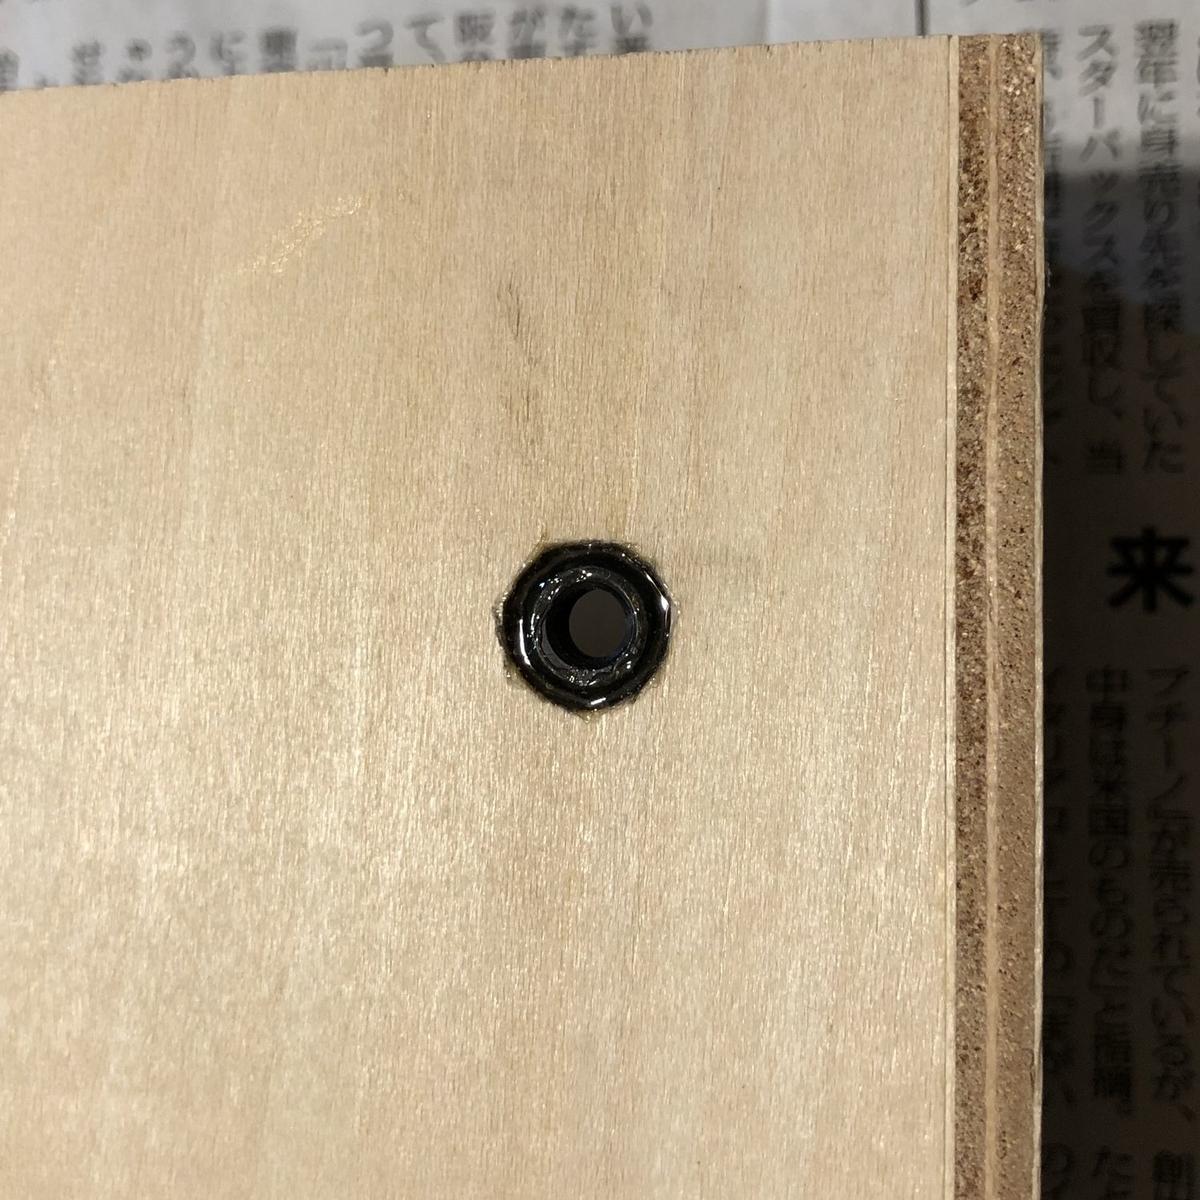 f:id:shiratsume:20200110131332j:plain